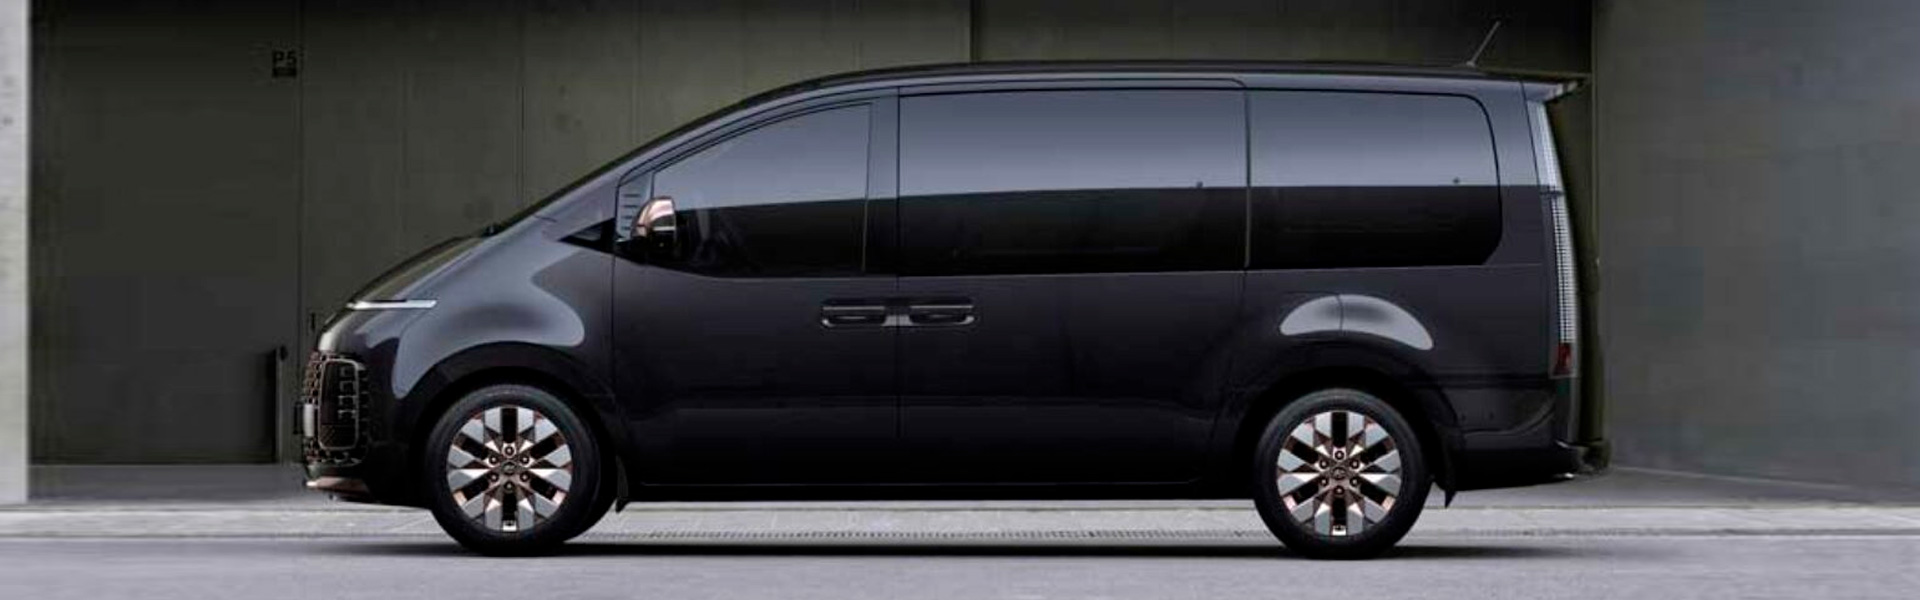 Hyundai STARIA - обзор